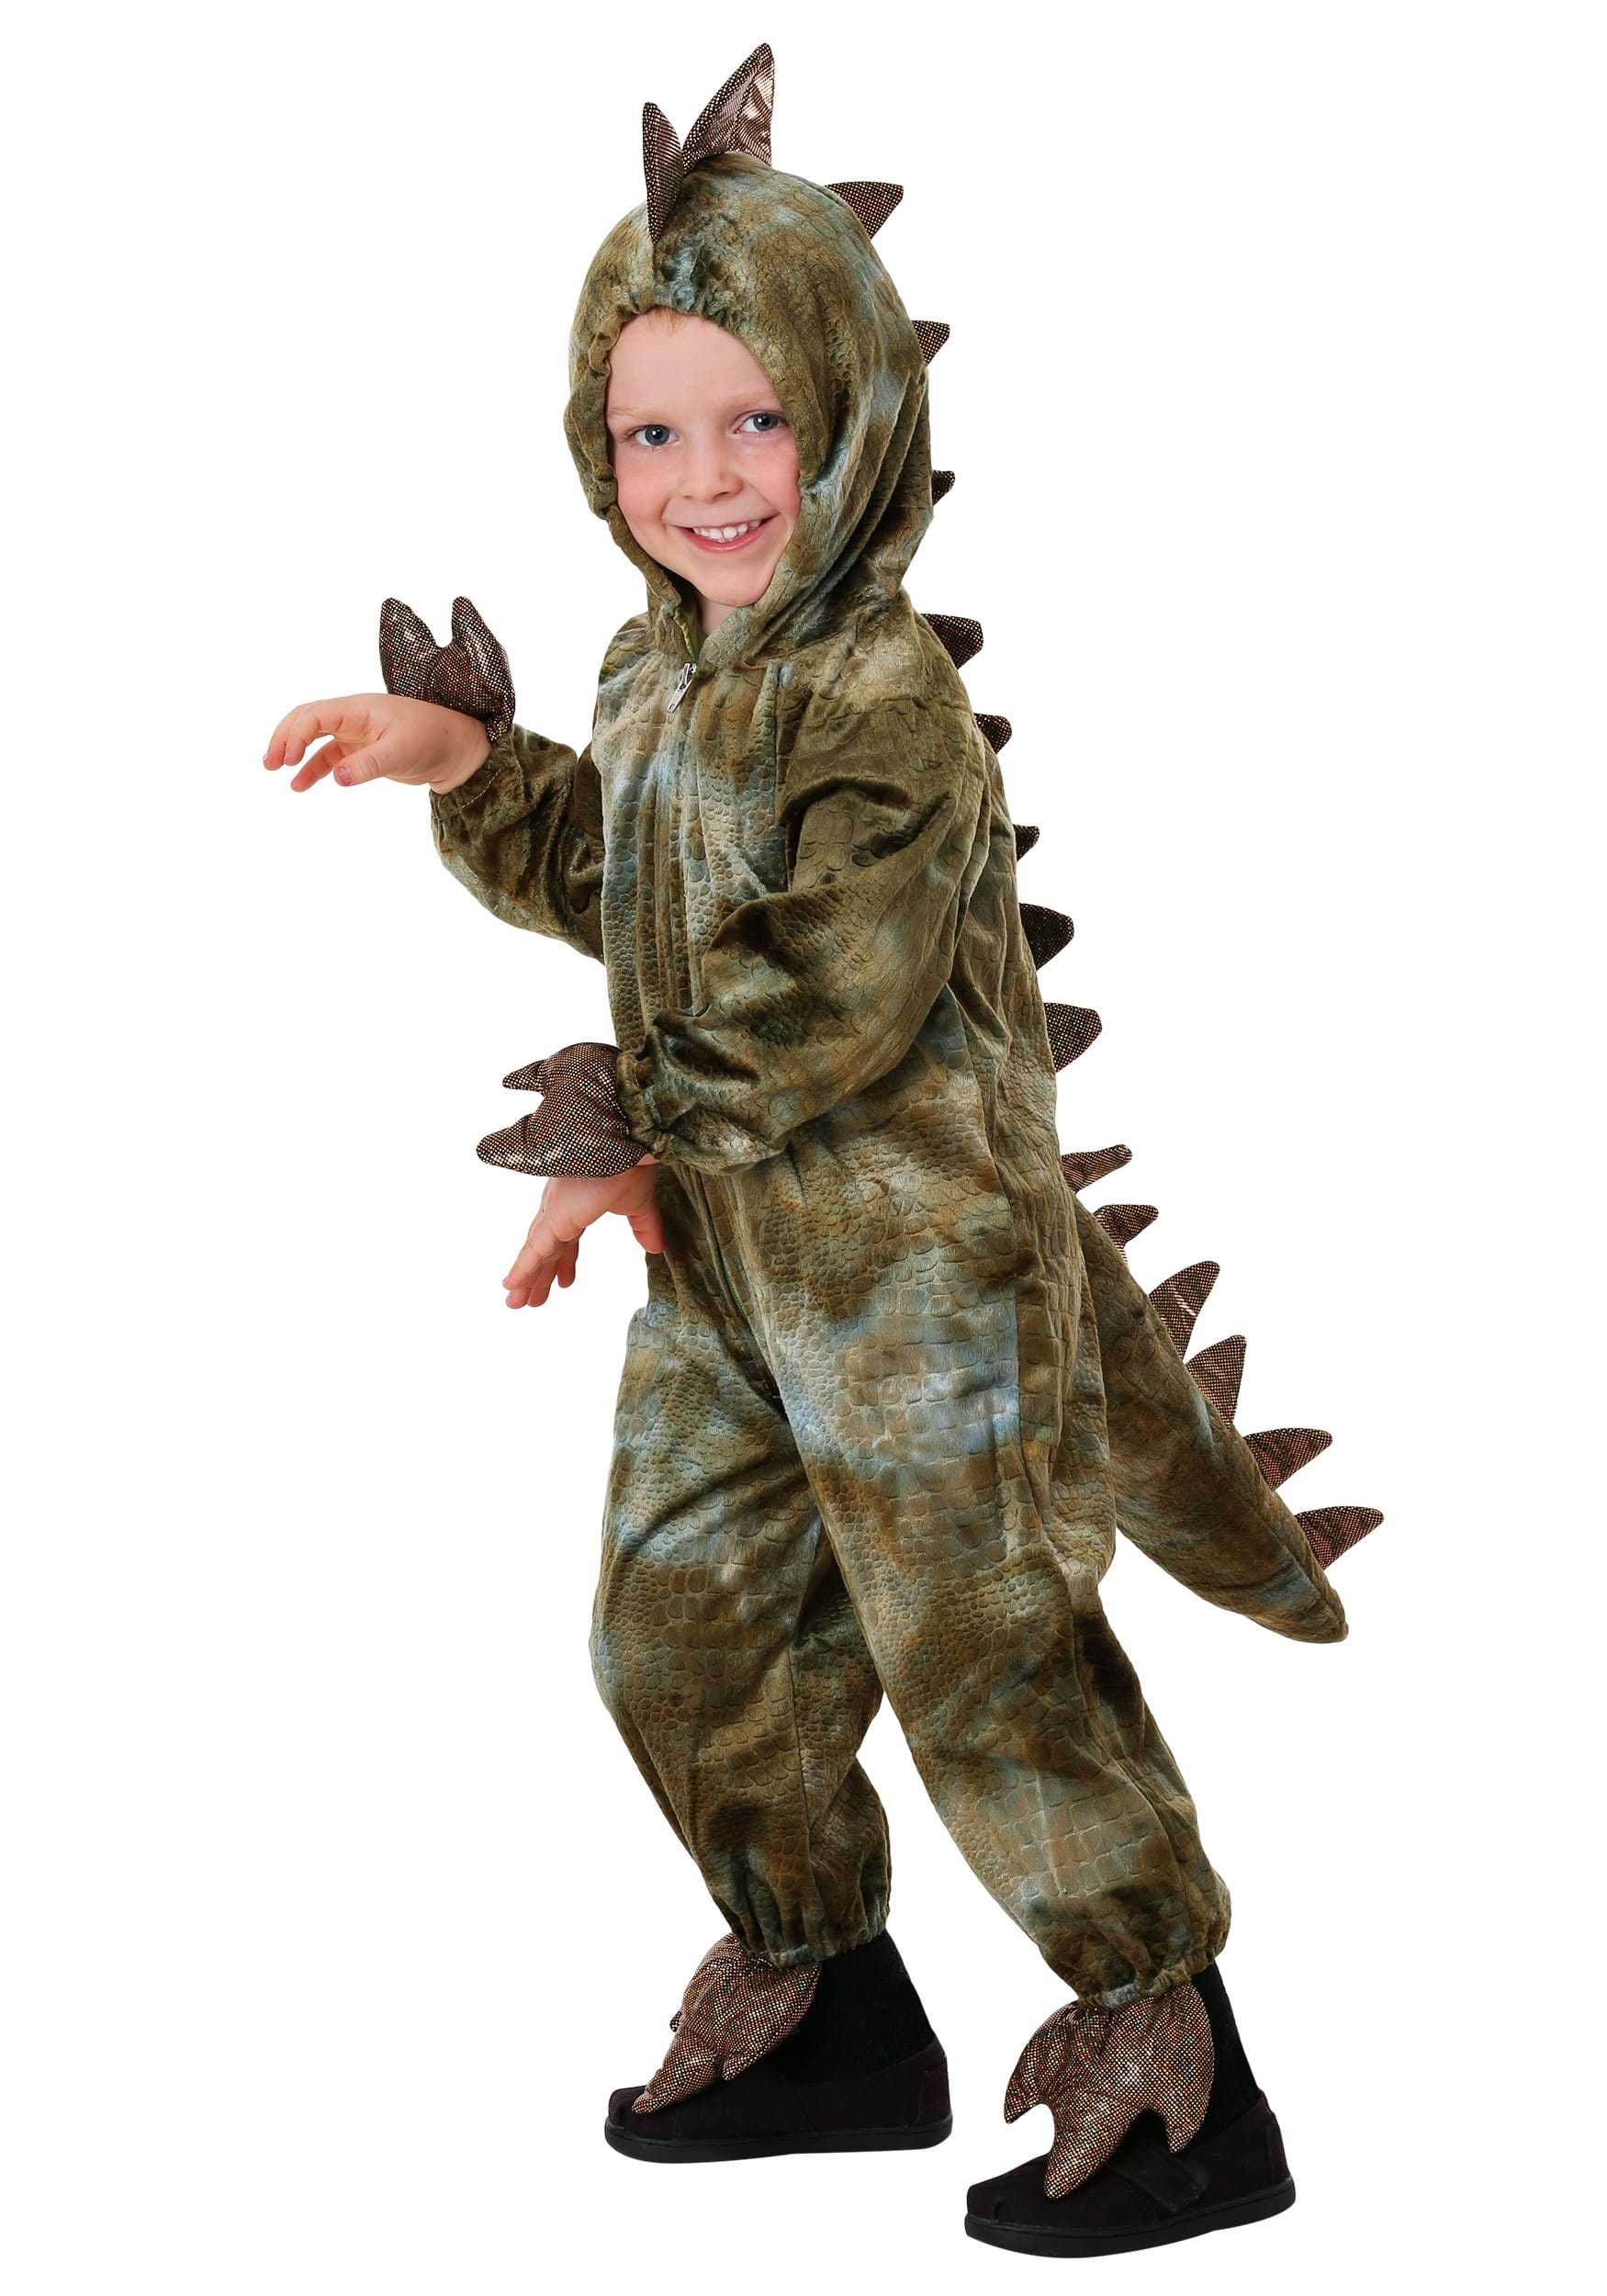 Kids Dinosaur Costume  sc 1 st  Halloween Costume & Child Dinosaur Costume - Kids Toddler Dinosaur Costumes